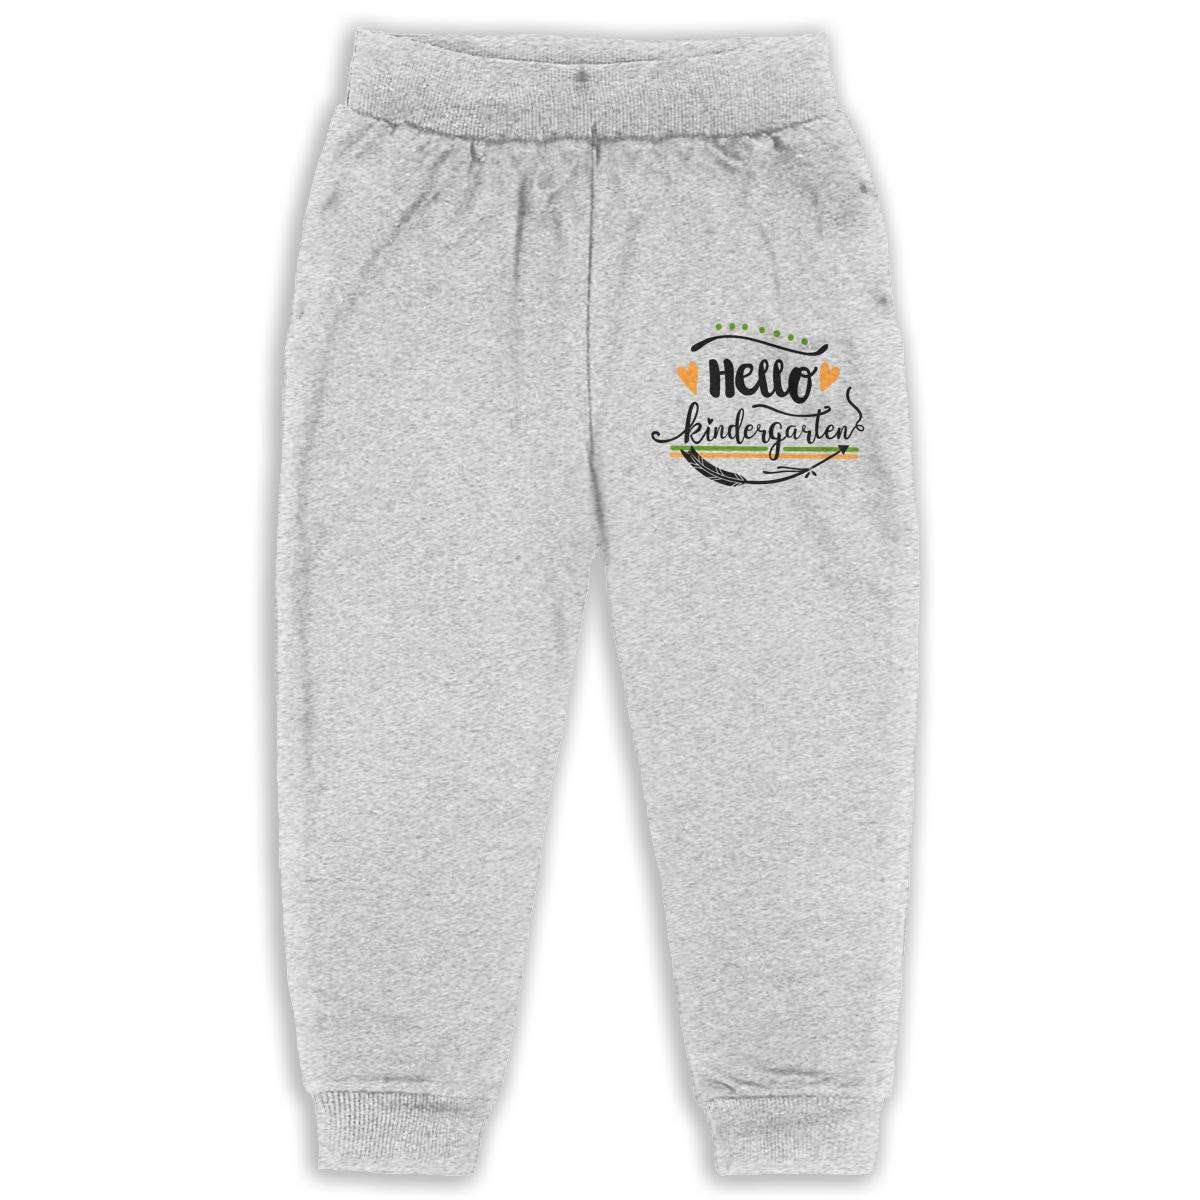 GHYNJUM Hello Kindergarten Unisex 2-6T Autumn Winter Cotton Fashion Trousers Child